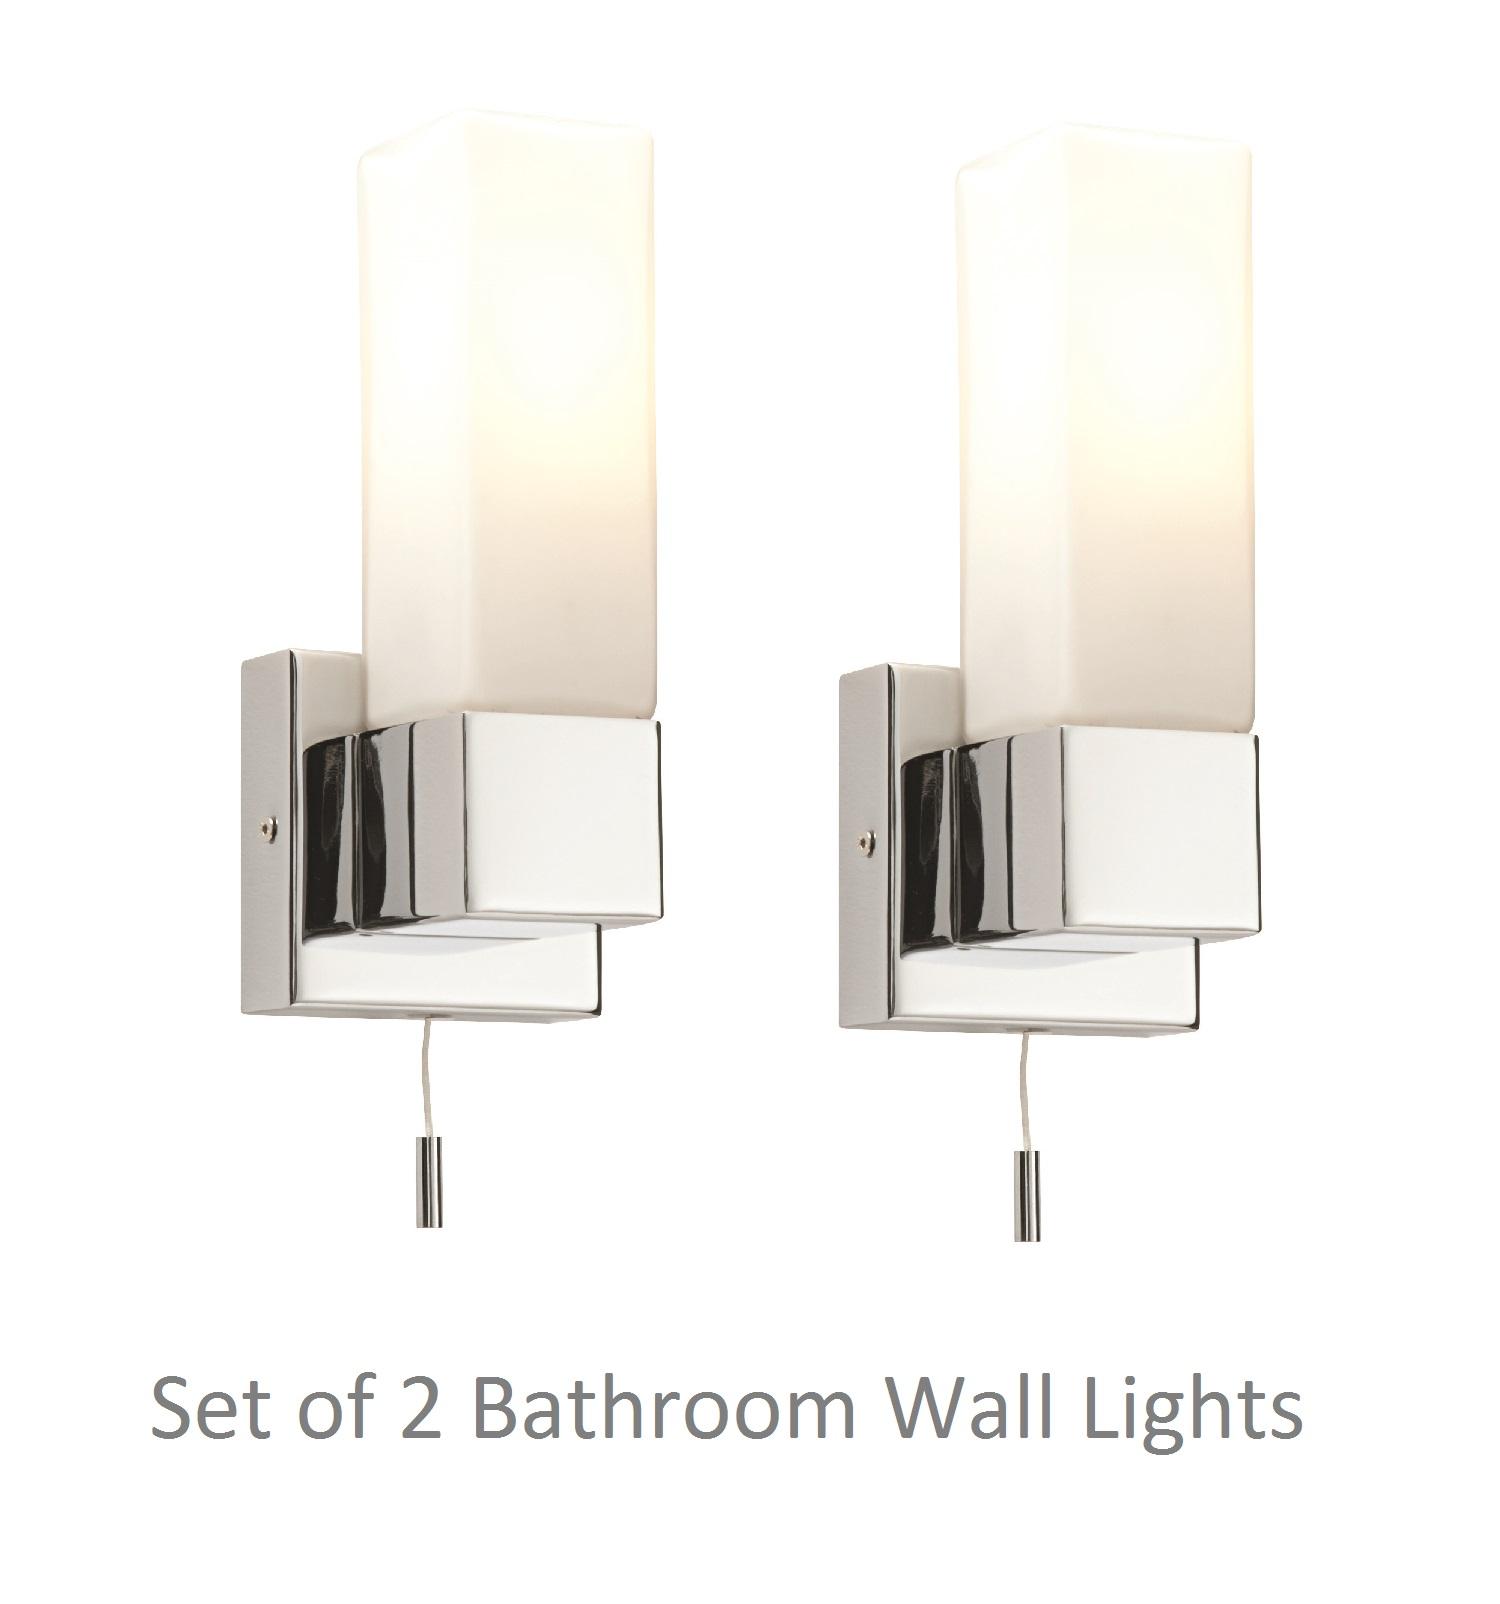 Bathroom lighting zone 2 bathroom zones home design for Bathroom zone 2 ip rating